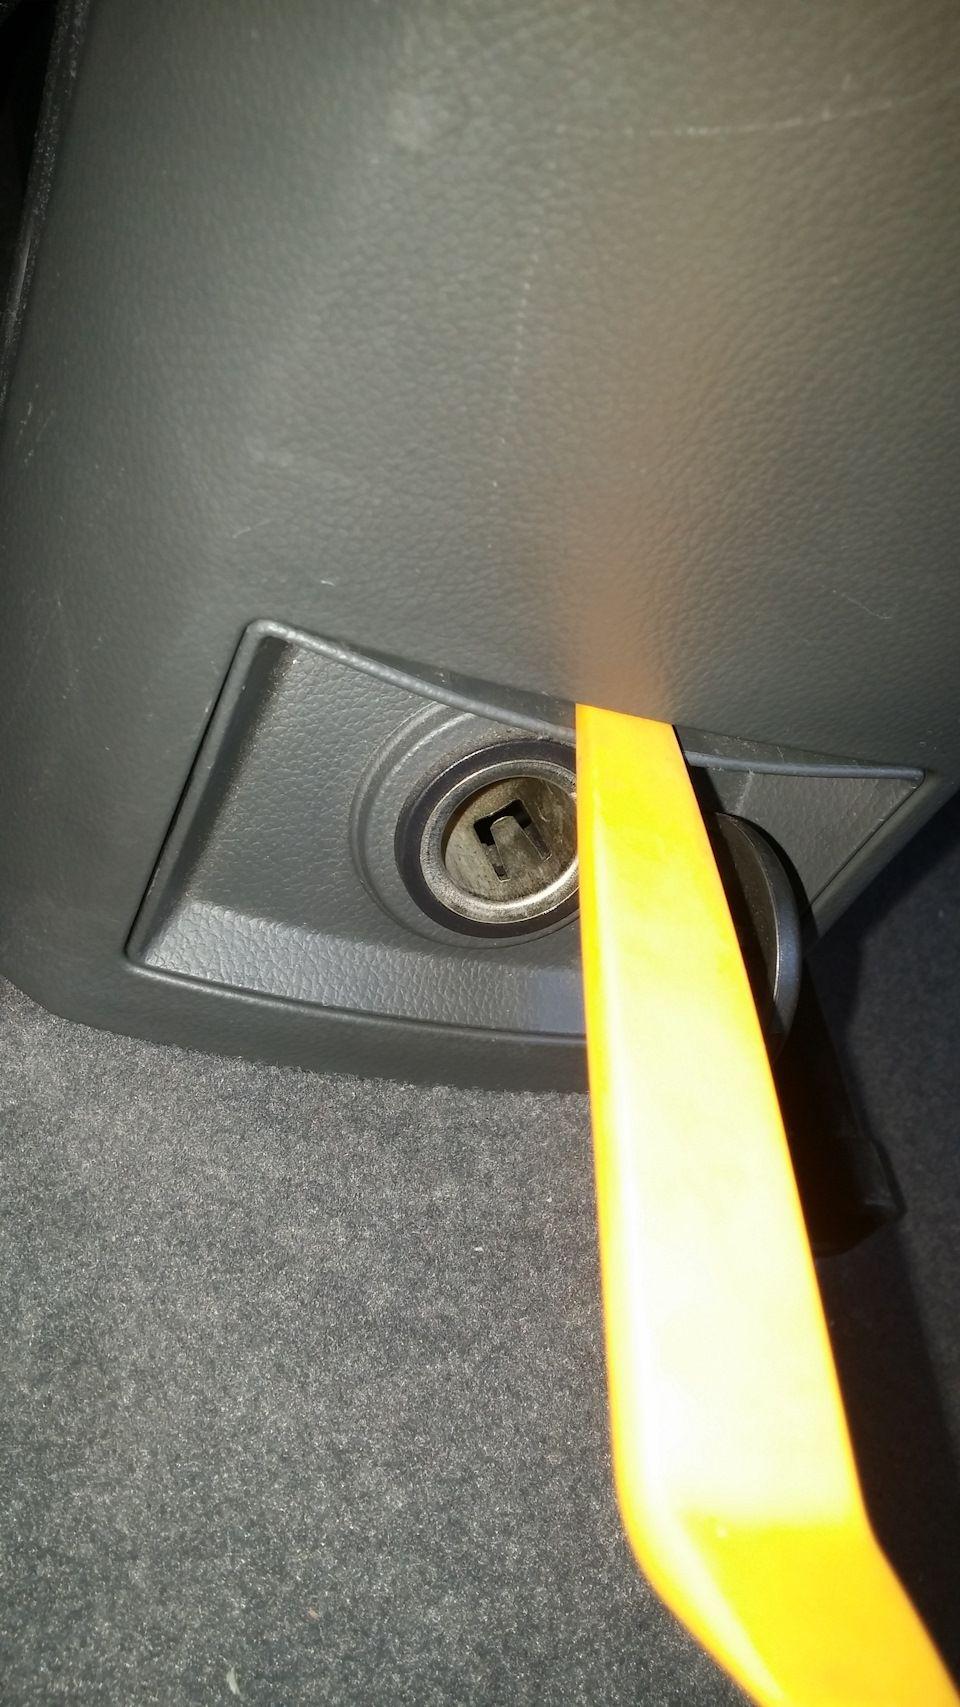 Замена тросов стояночного тормоза Chevrolet Cruze